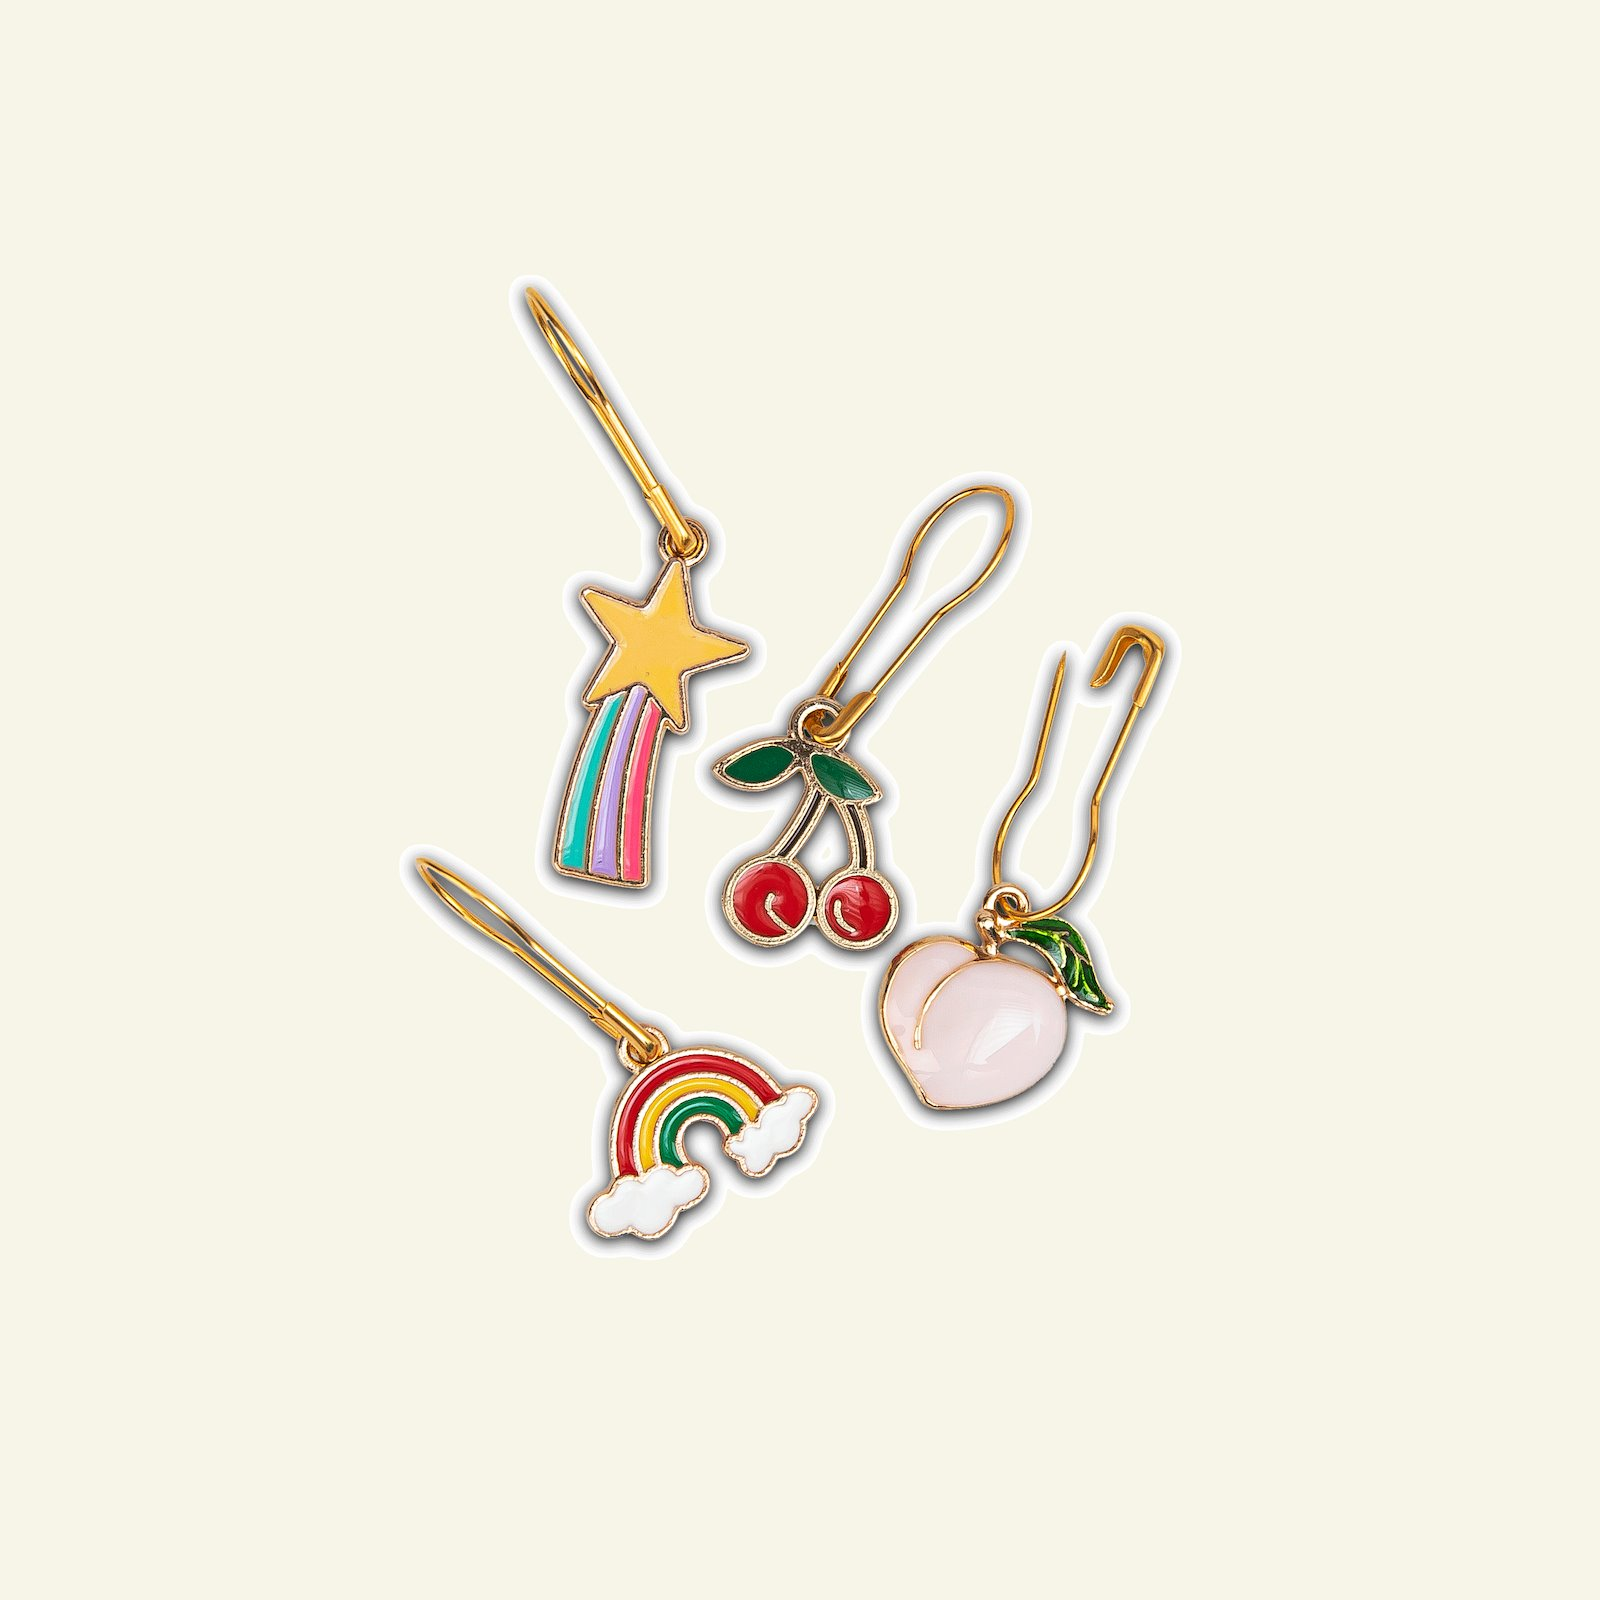 "FRAYA Stitch markers ""Rainbow"" 4pcs 83302_pack"